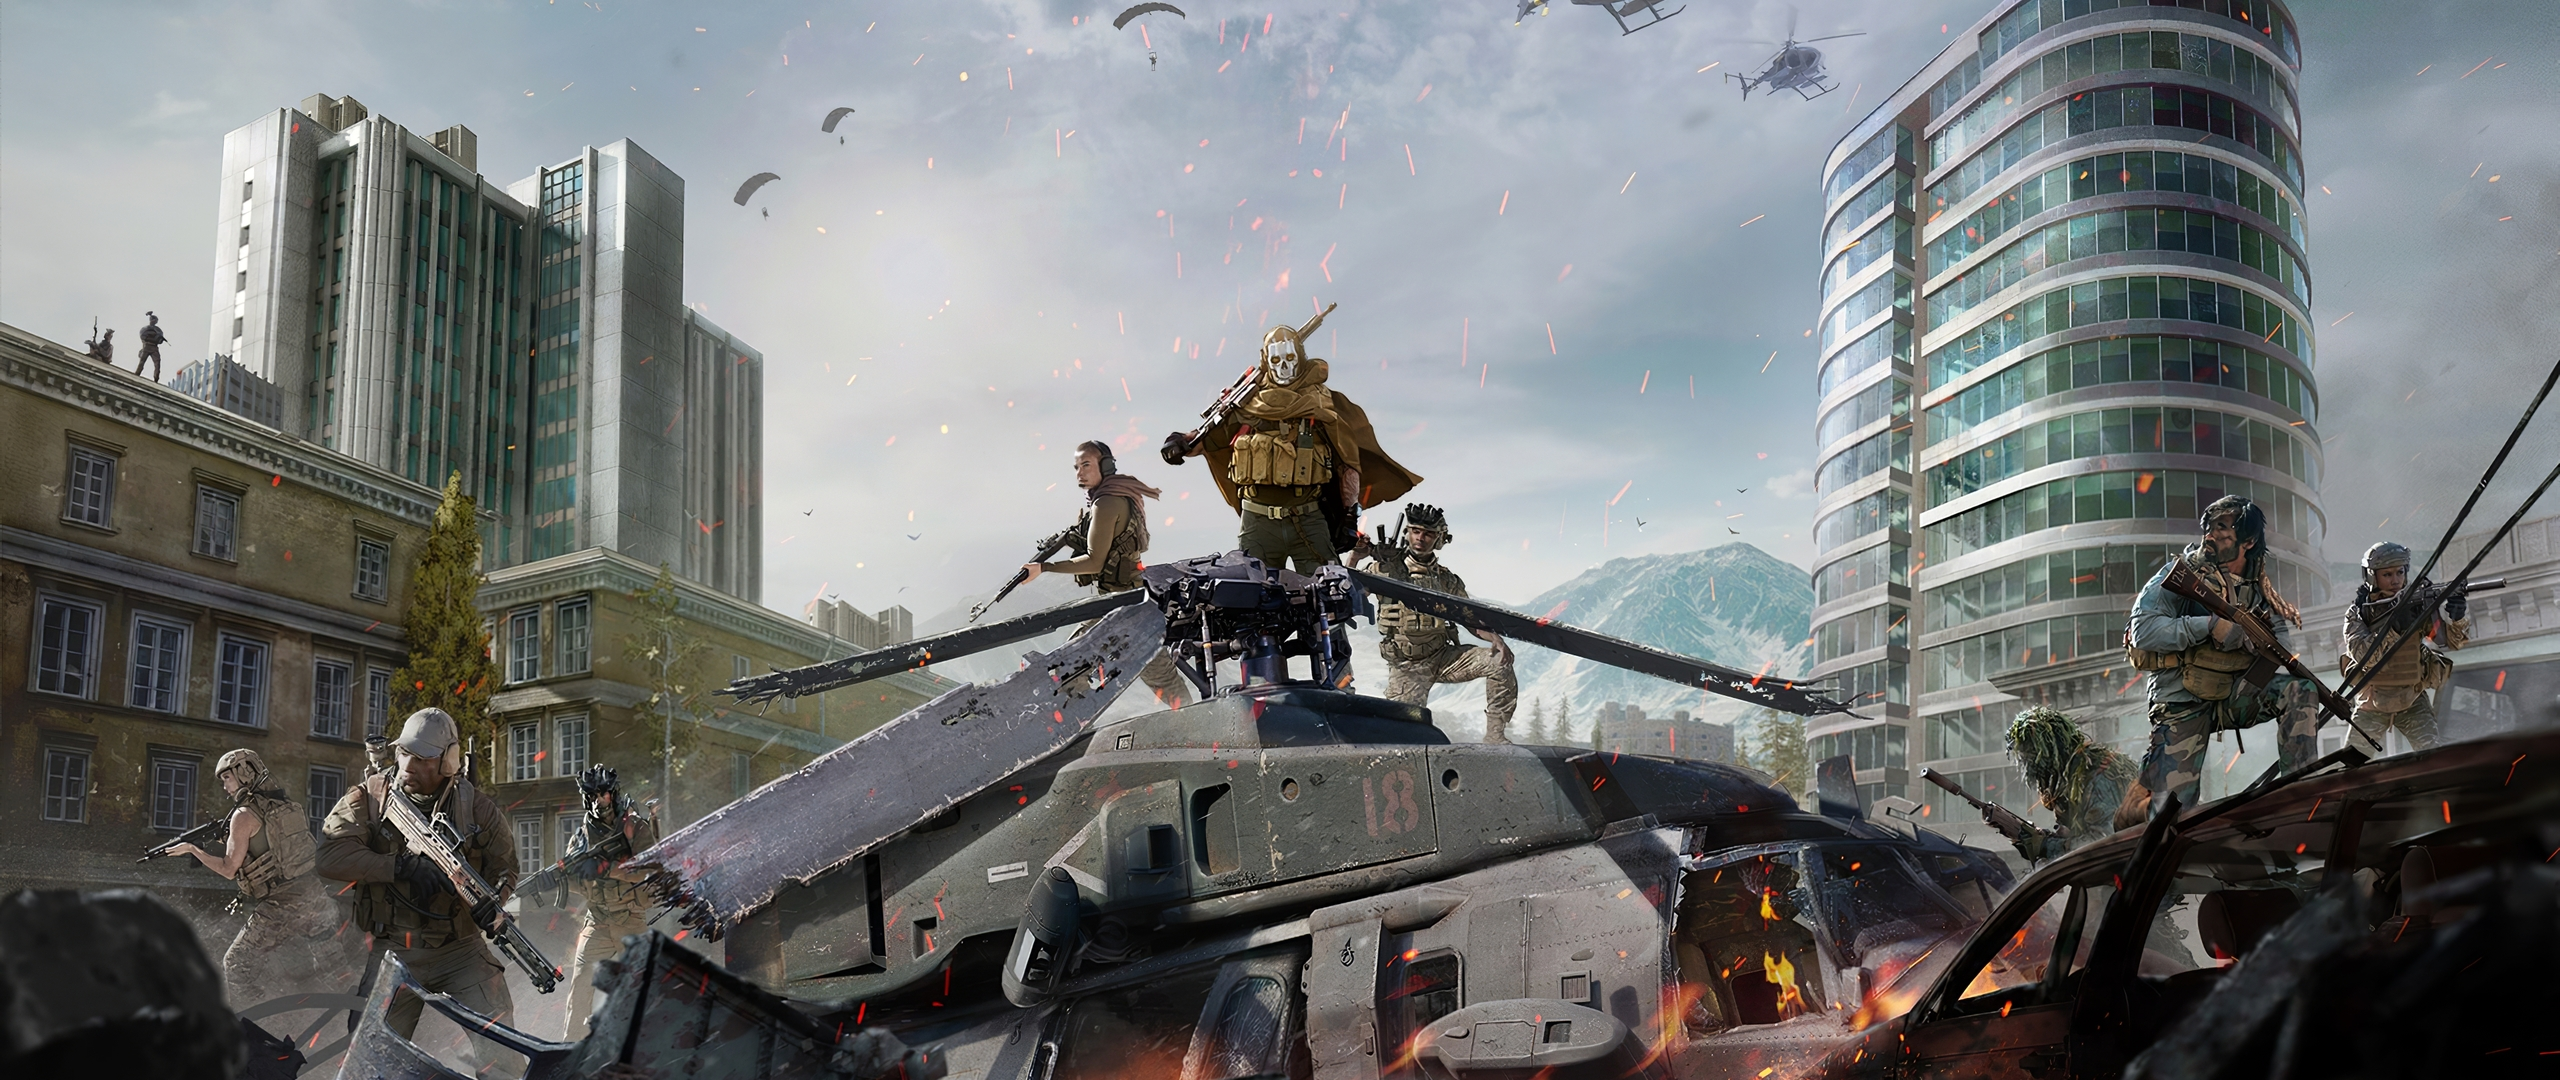 2560x1080 Call Of Duty Warzone 4k 2560x1080 Resolution Hd 4k